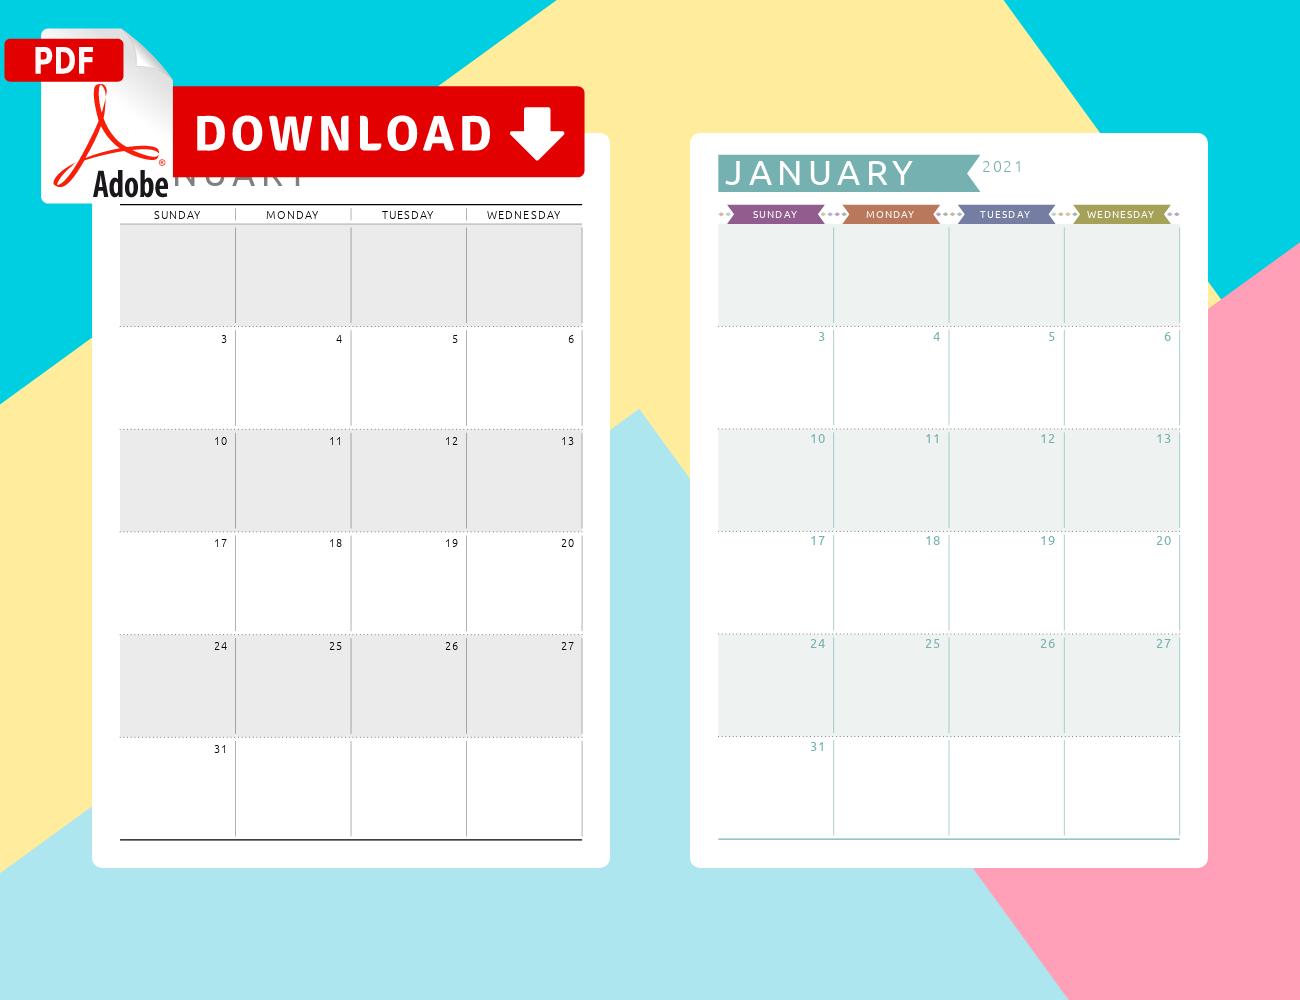 January 2021 Calendar - Download Printable Templates PDF